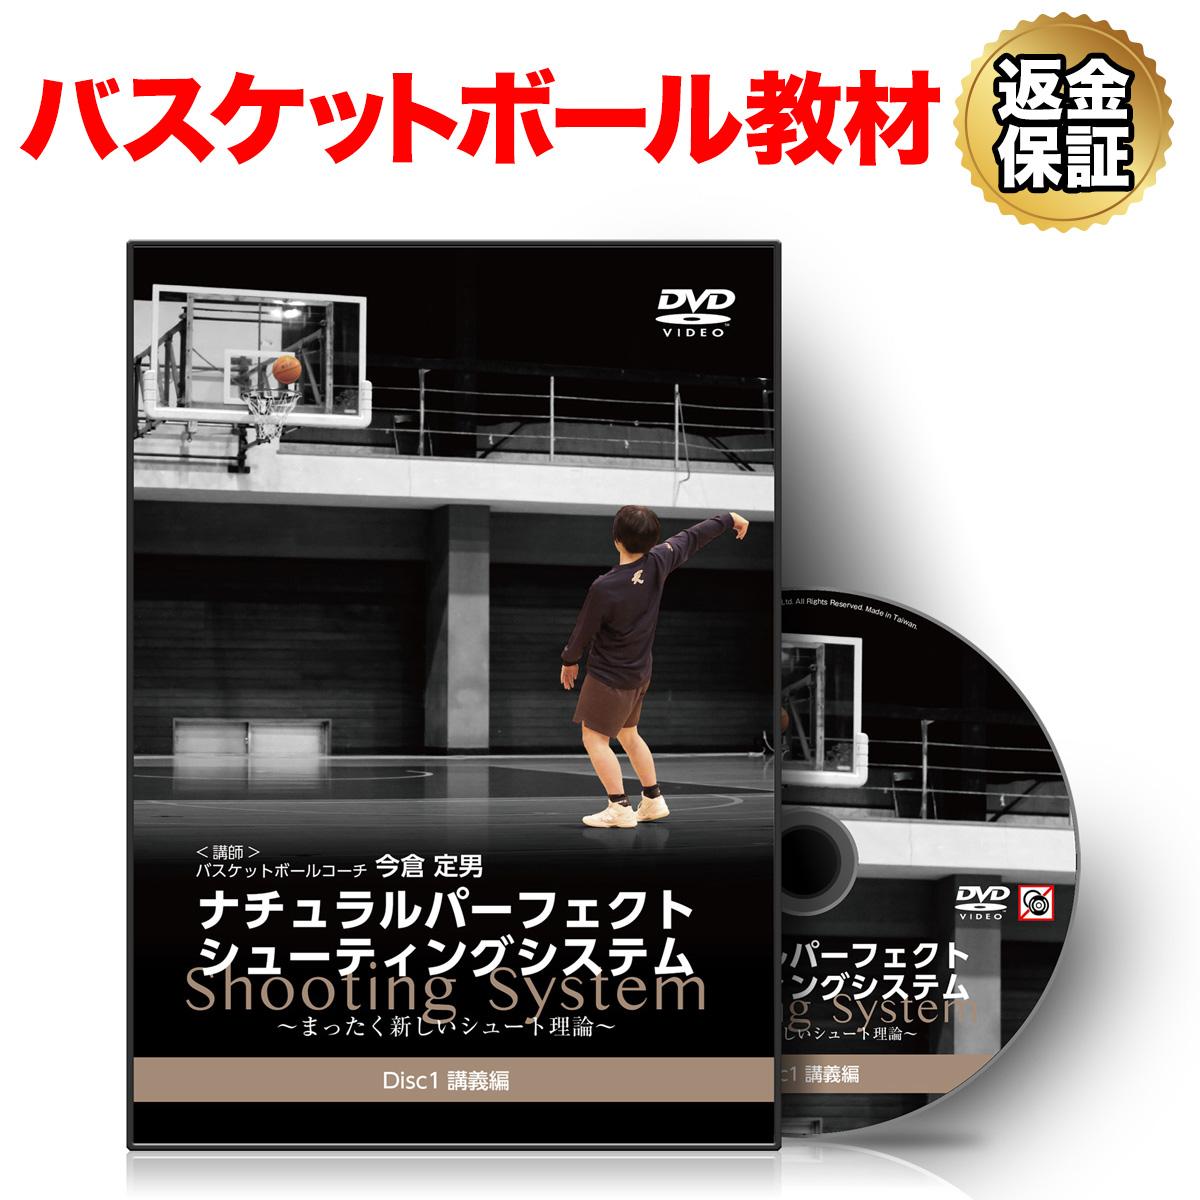 <title>今倉定男が教えるシュートの秘訣を公開 高品質新品 バスケットボール 教材 DVD ナチュラルパーフェクトシューティングシステム ~まったく新しいシュート理論~ 講義編</title>